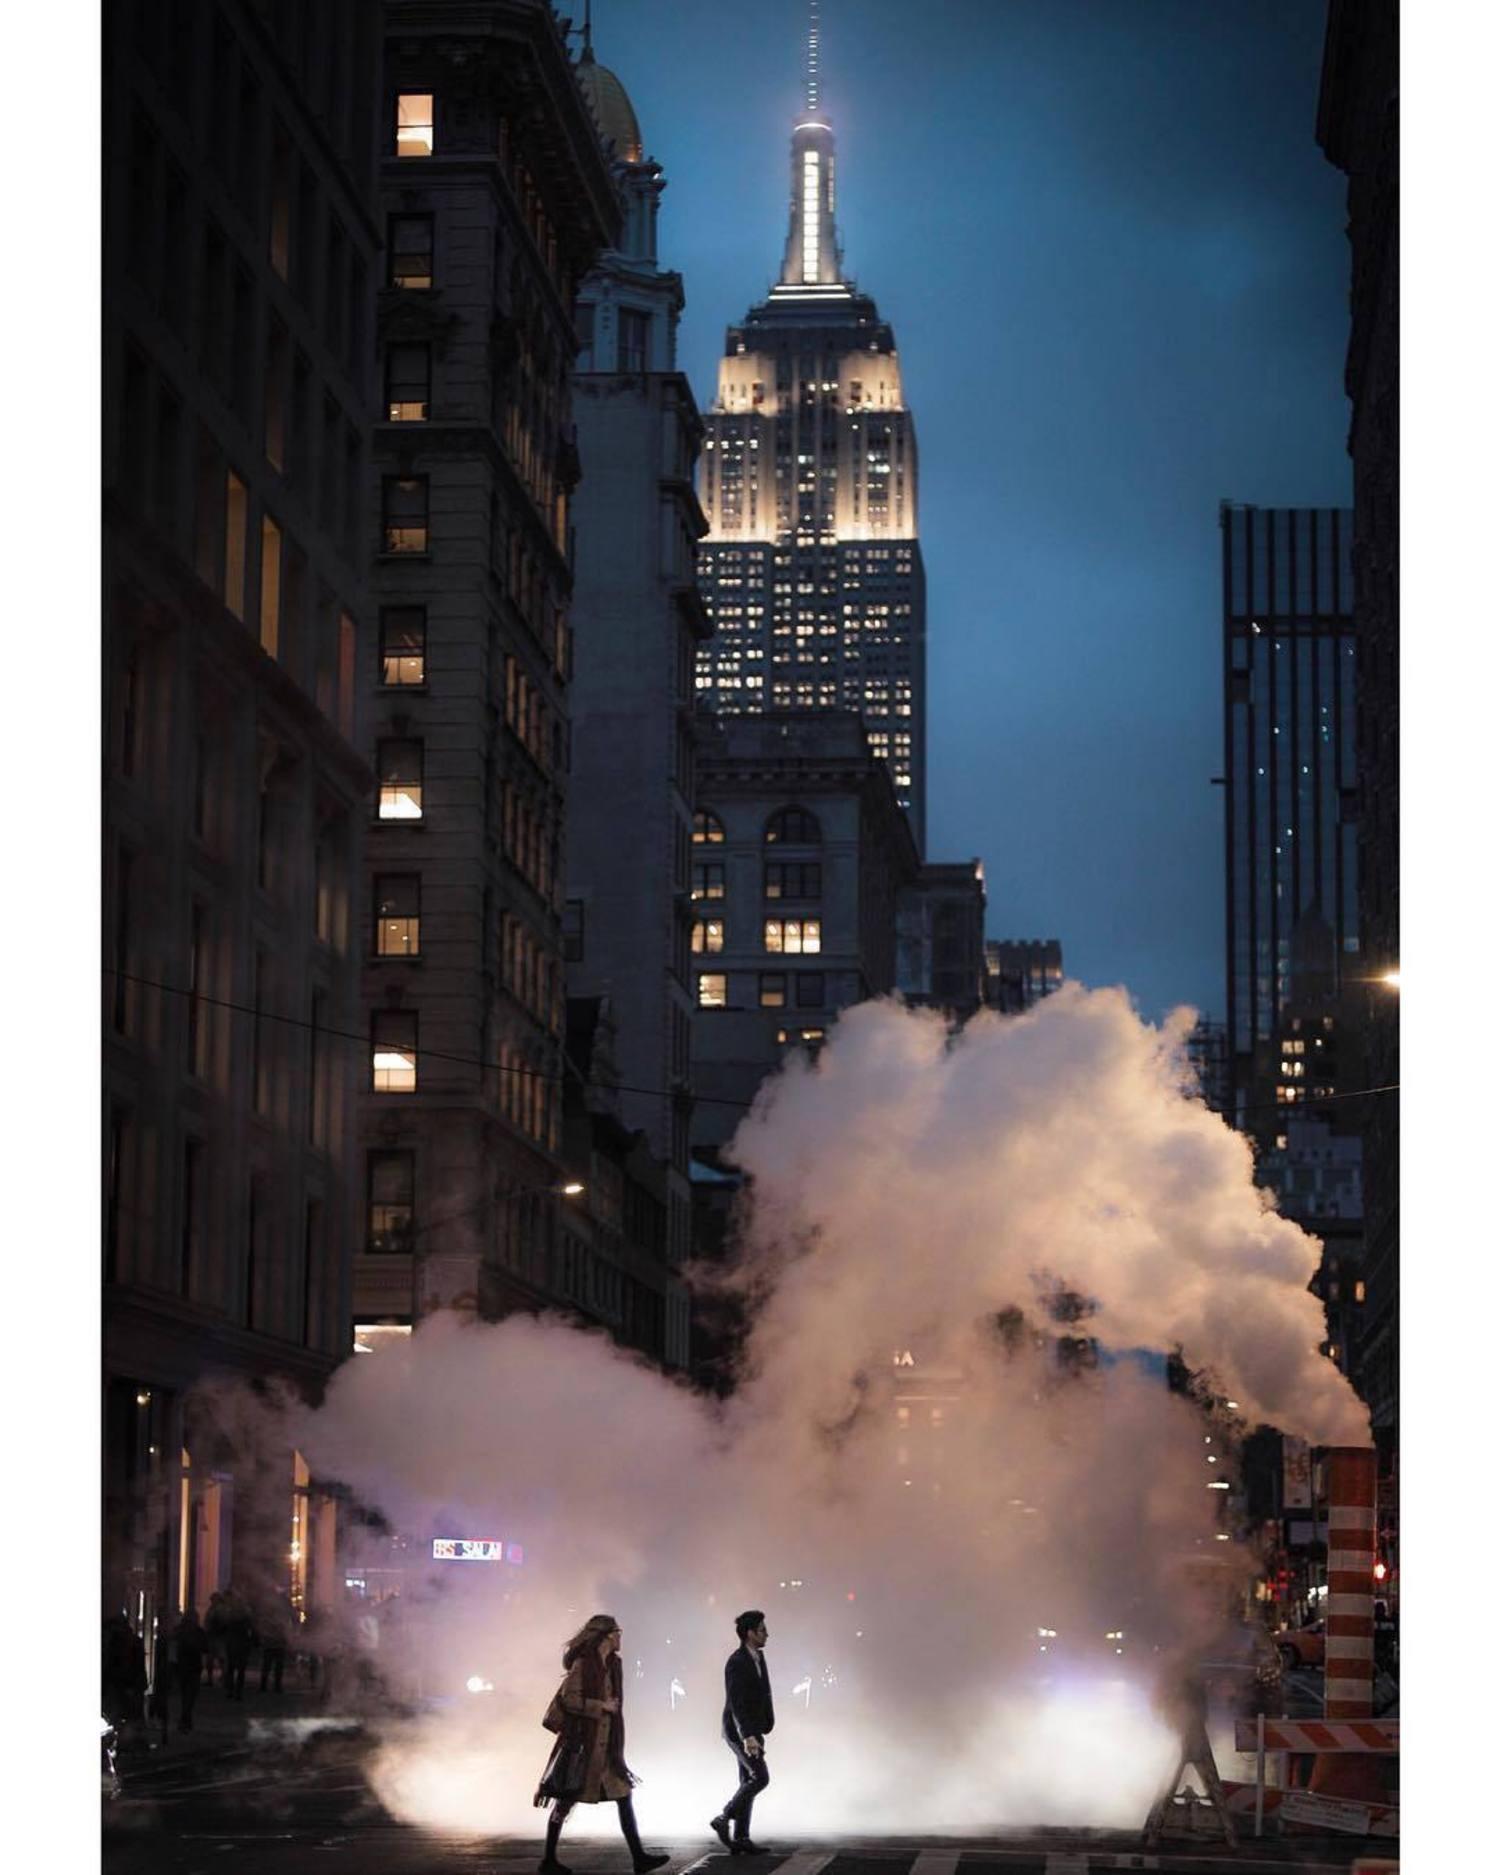 Midtown, Manhattan. Photo via @raylivez #viewingnyc #nyc #newyork #newyorkcity #empirestatebuilding